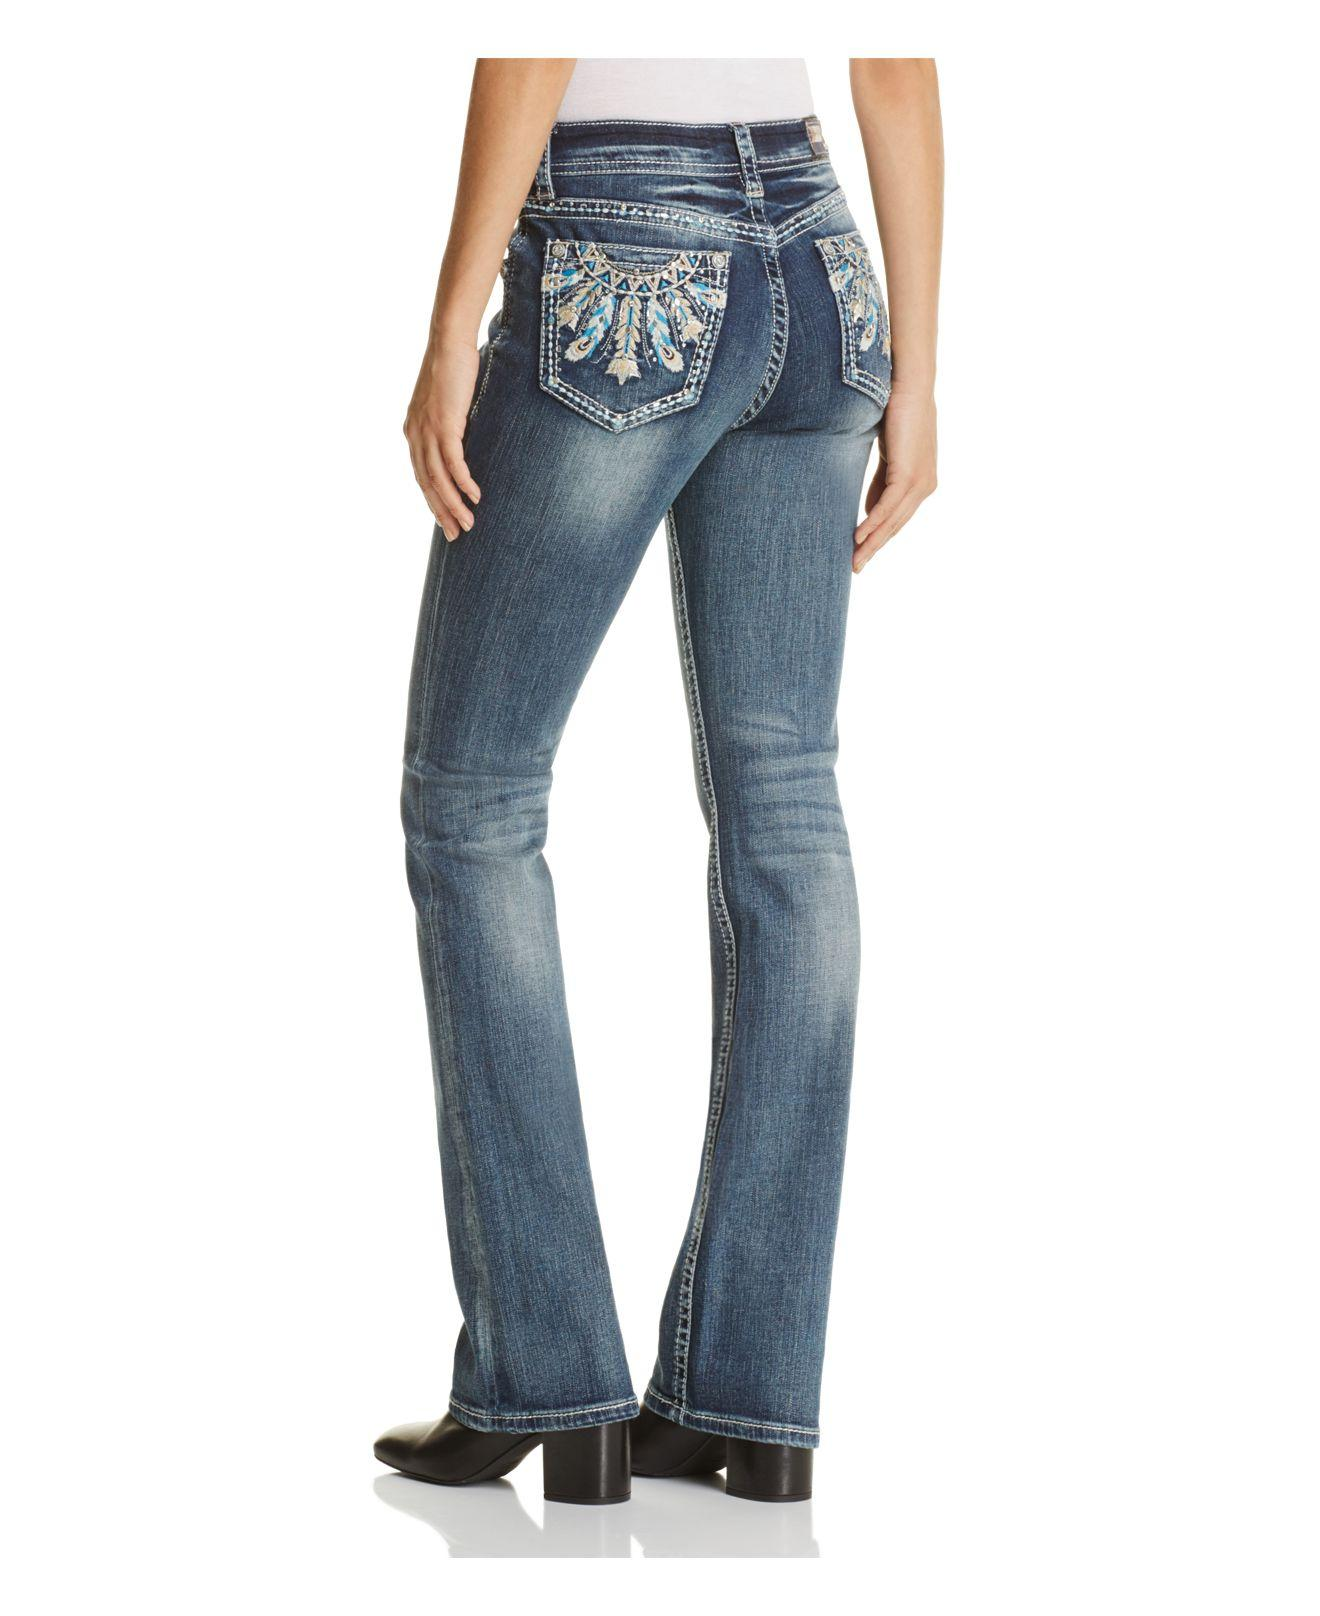 Grace In La Denim Multicolor Feather Embroidered Jeans In Medium Blue - Compare At $79